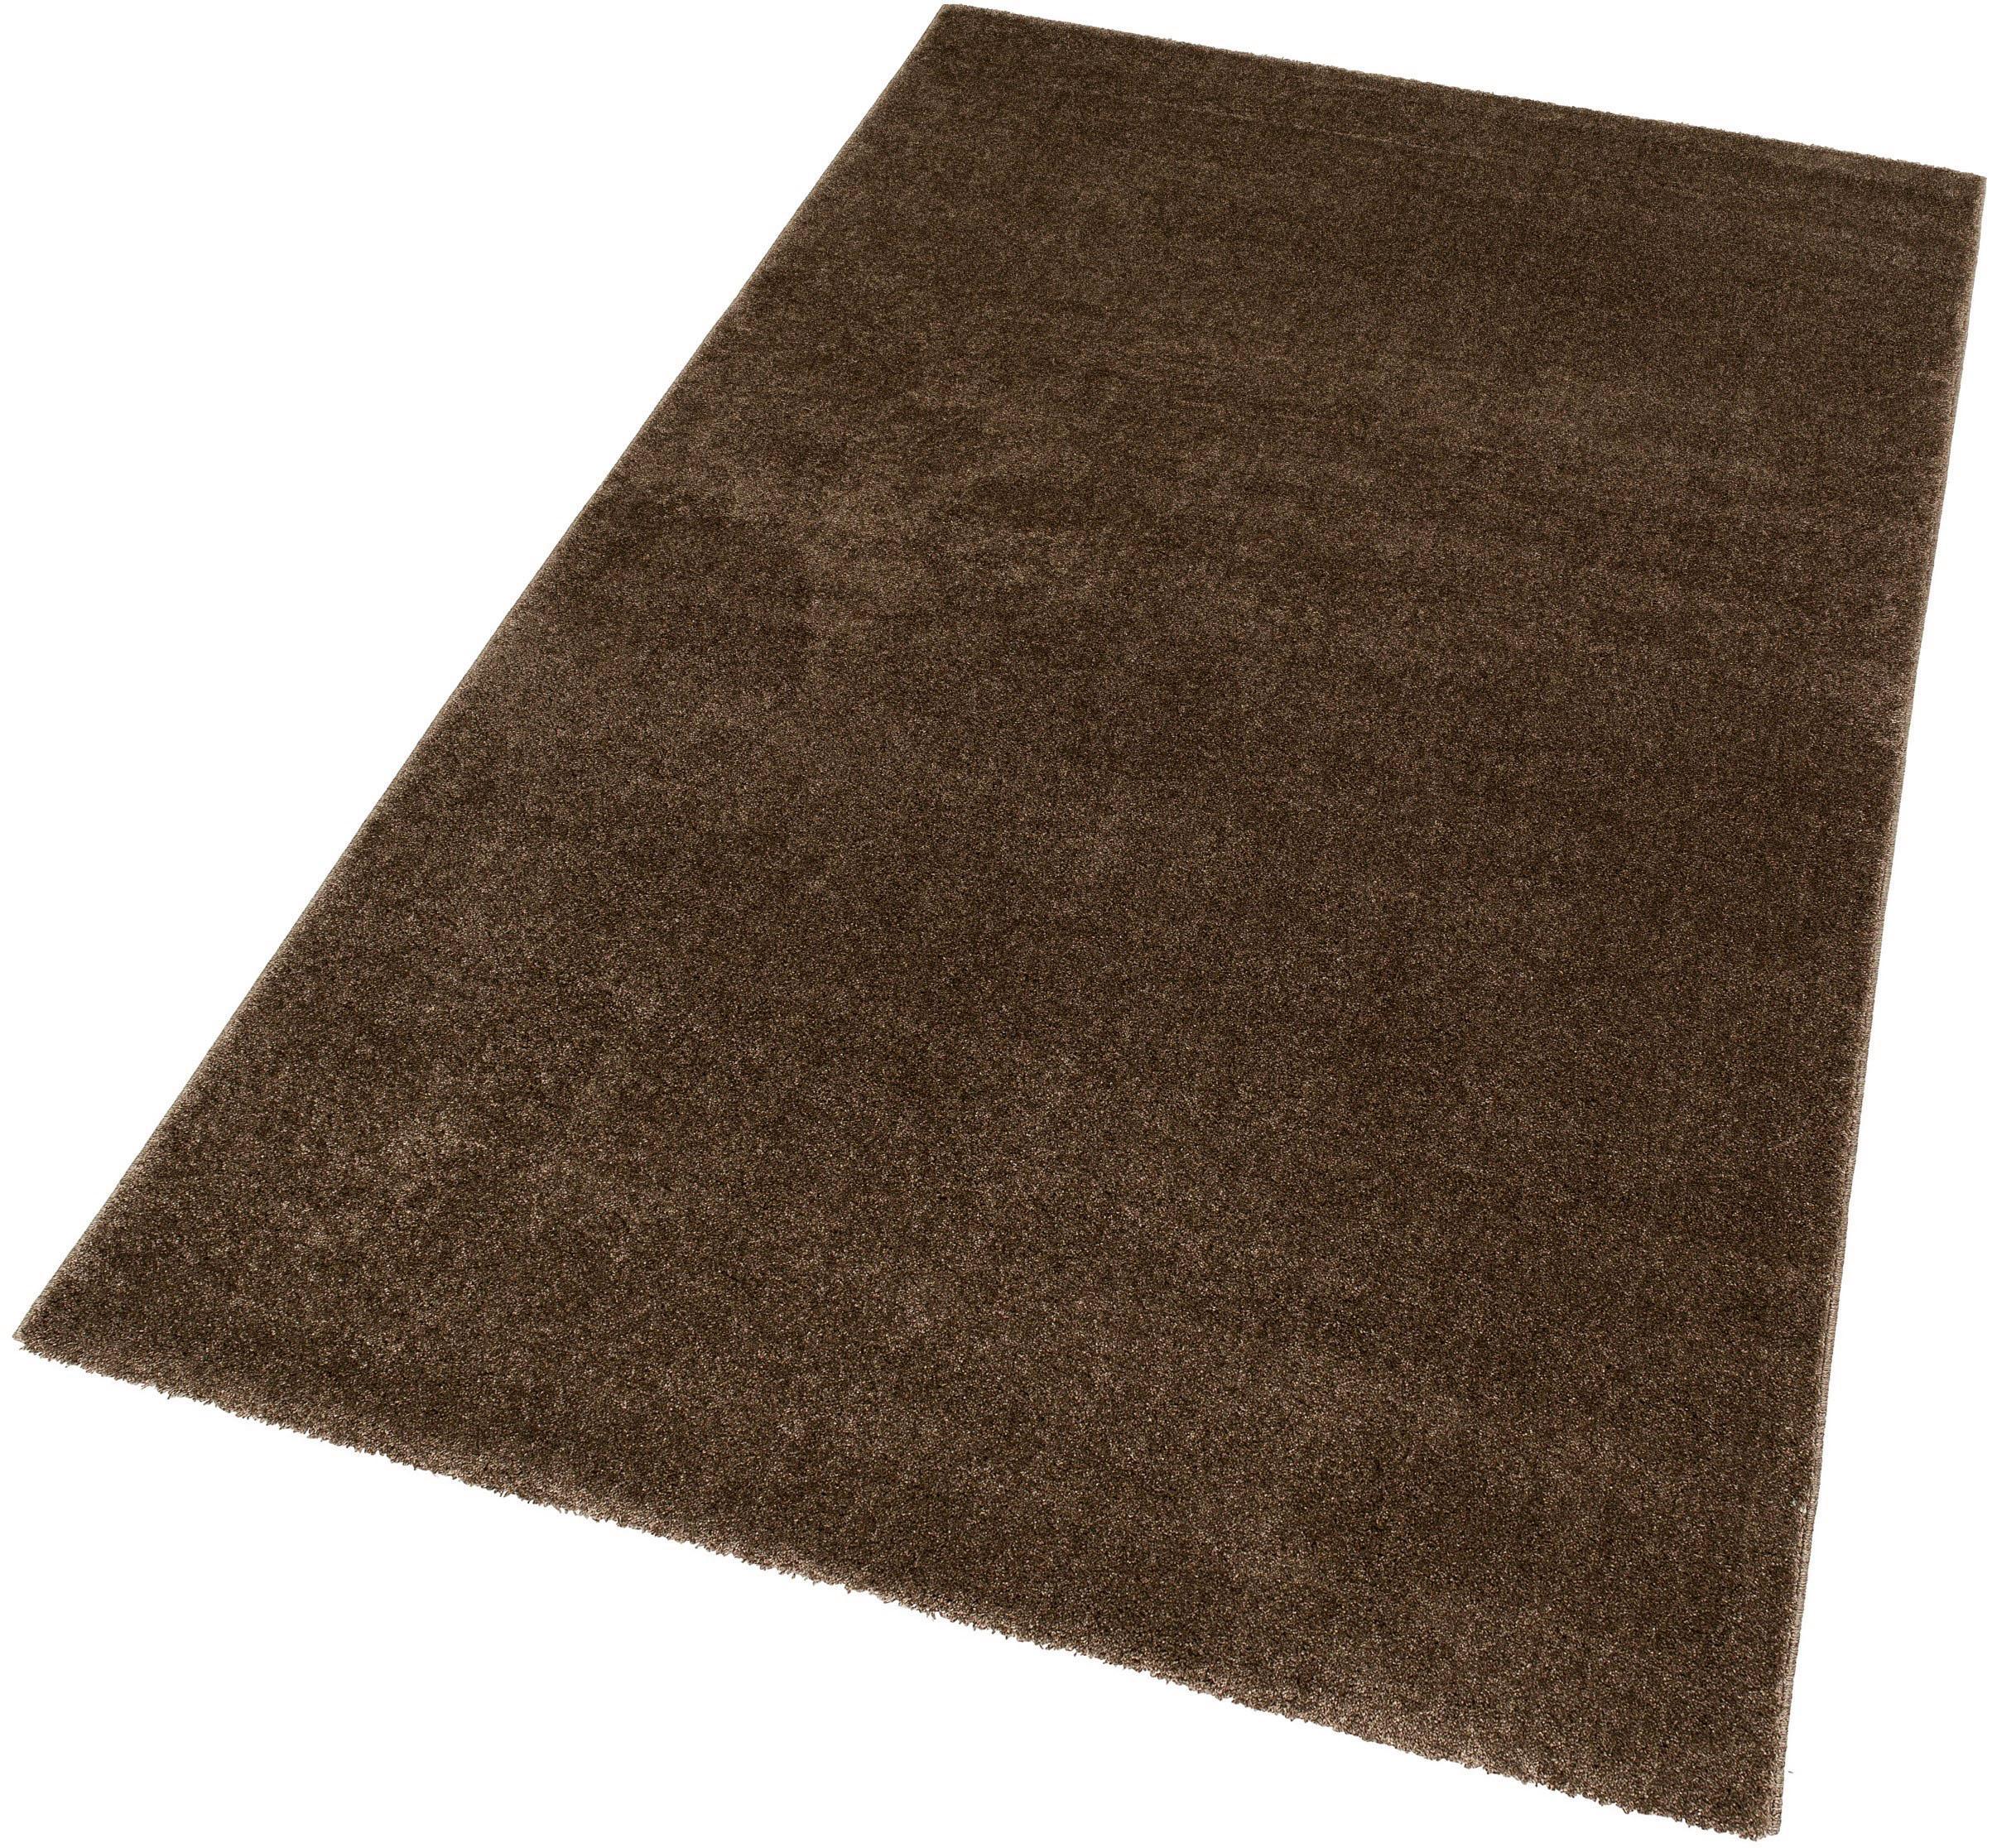 Teppich Ravello 170 ASTRA rechteckig Höhe 20 mm maschinell gewebt